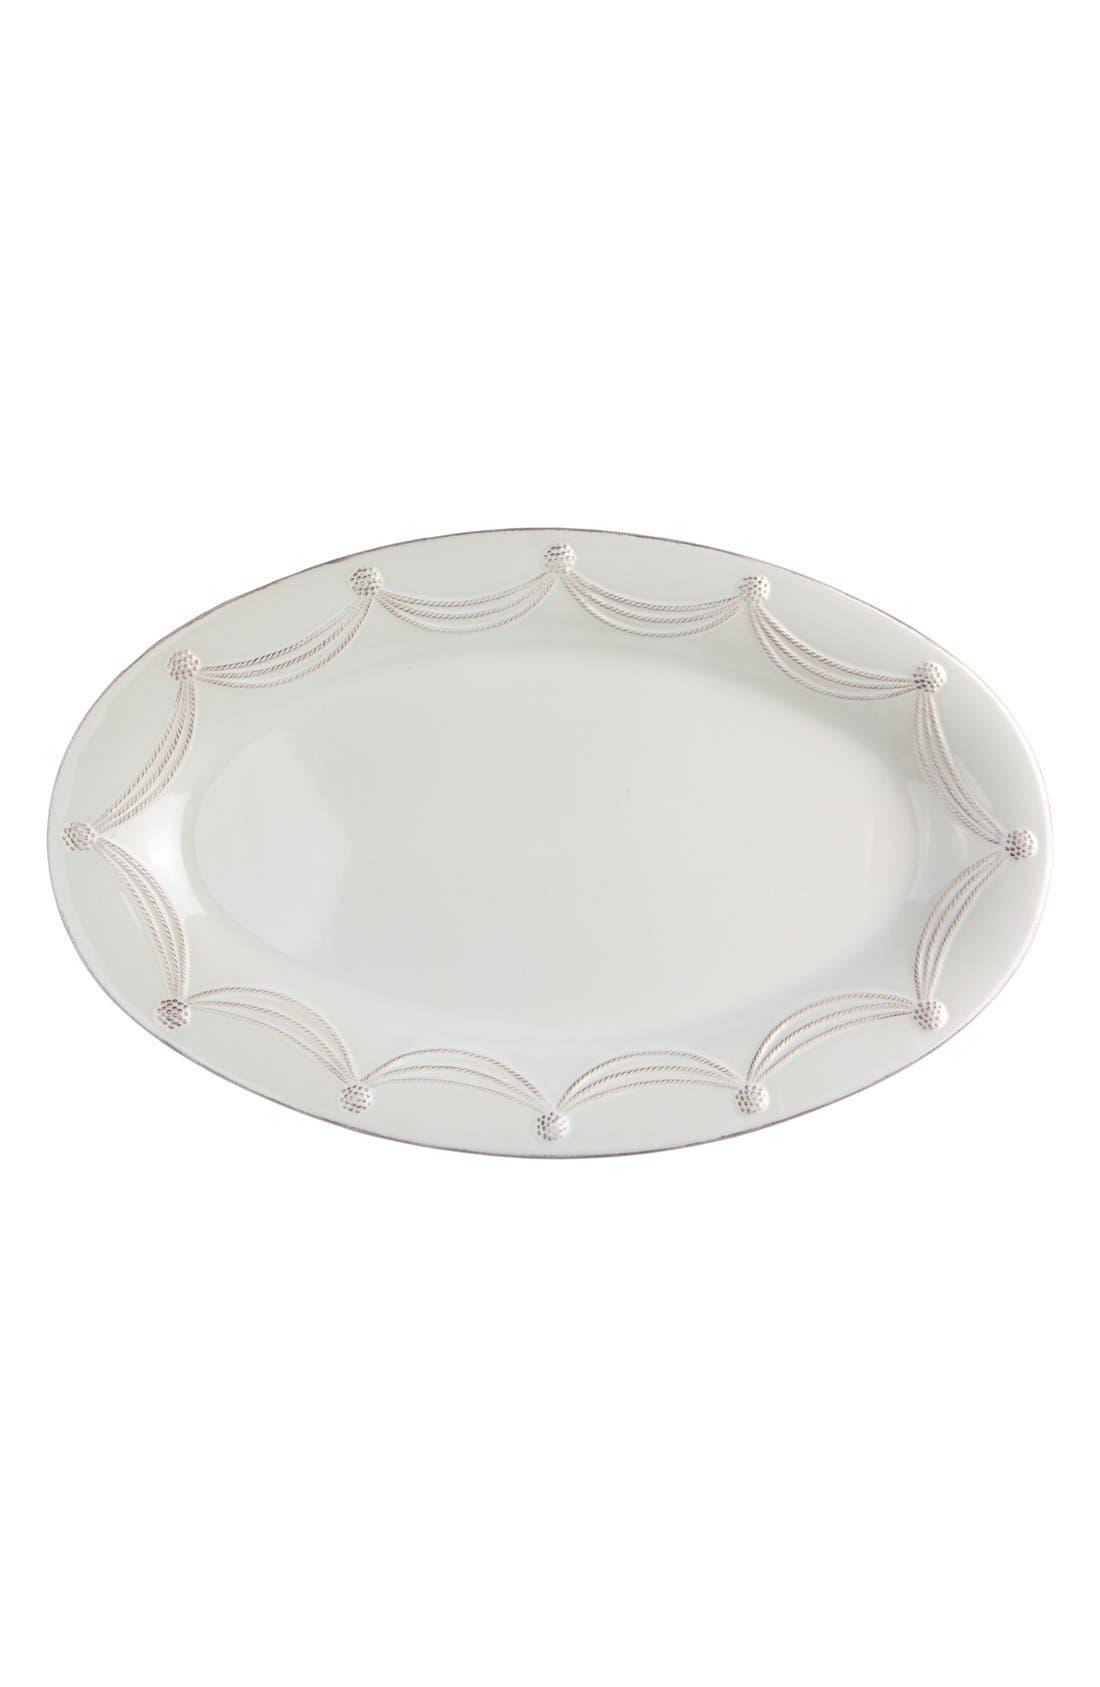 Alternate Image 1 Selected - Juliska 'Berry and Thread' Oval Platter